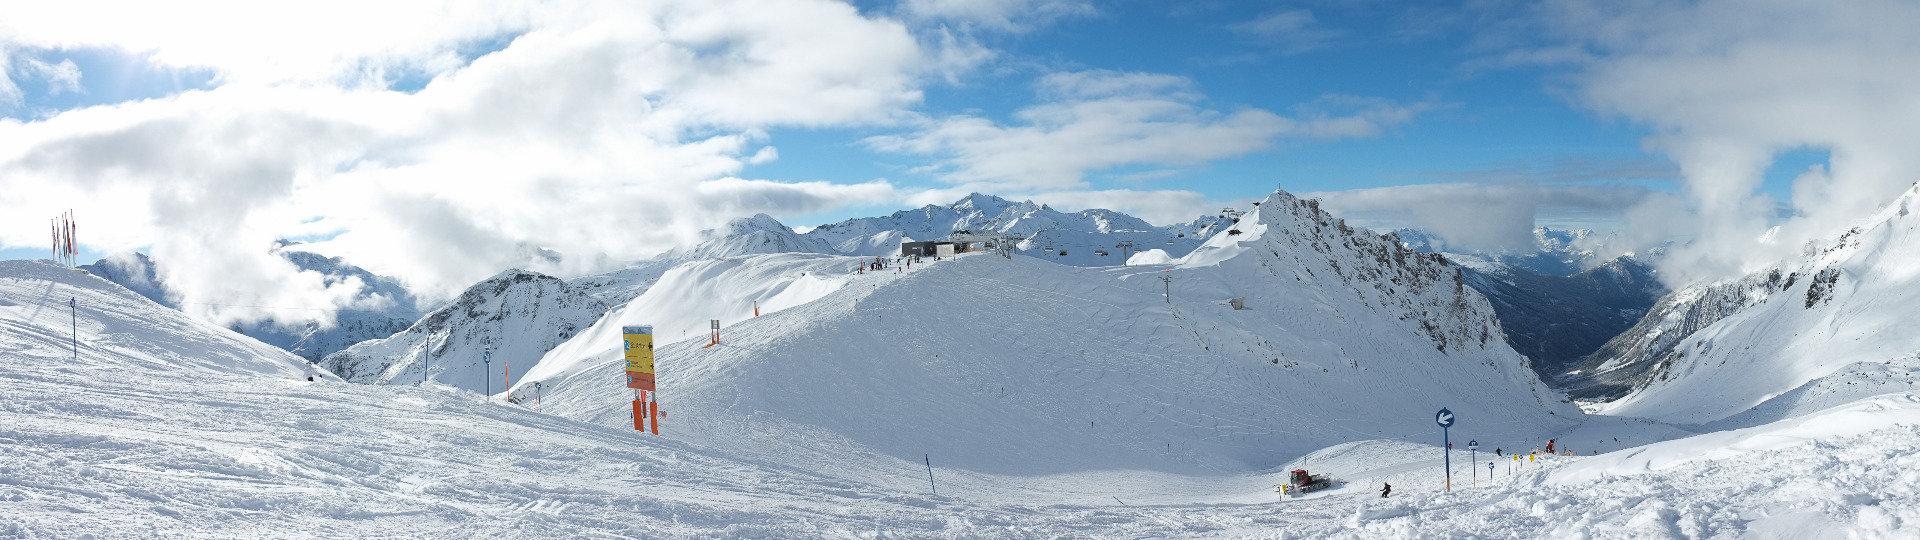 St Anton Arlberg - ©Tim Bode